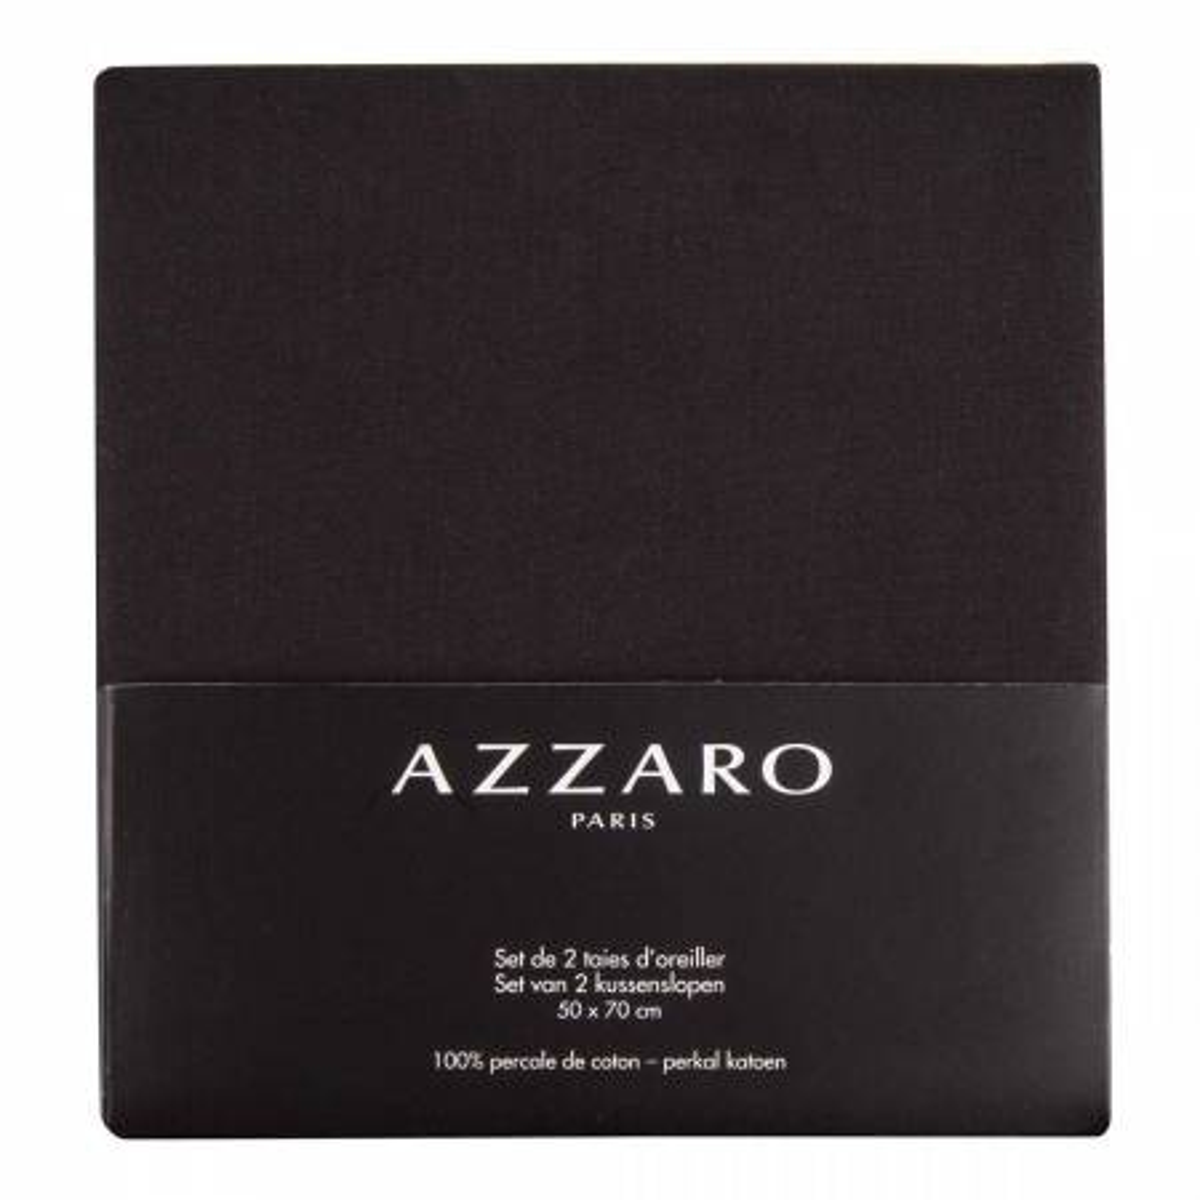 Azzaro Drap Plat 2 personnes 240 x 300 cm - 100% coton Percale